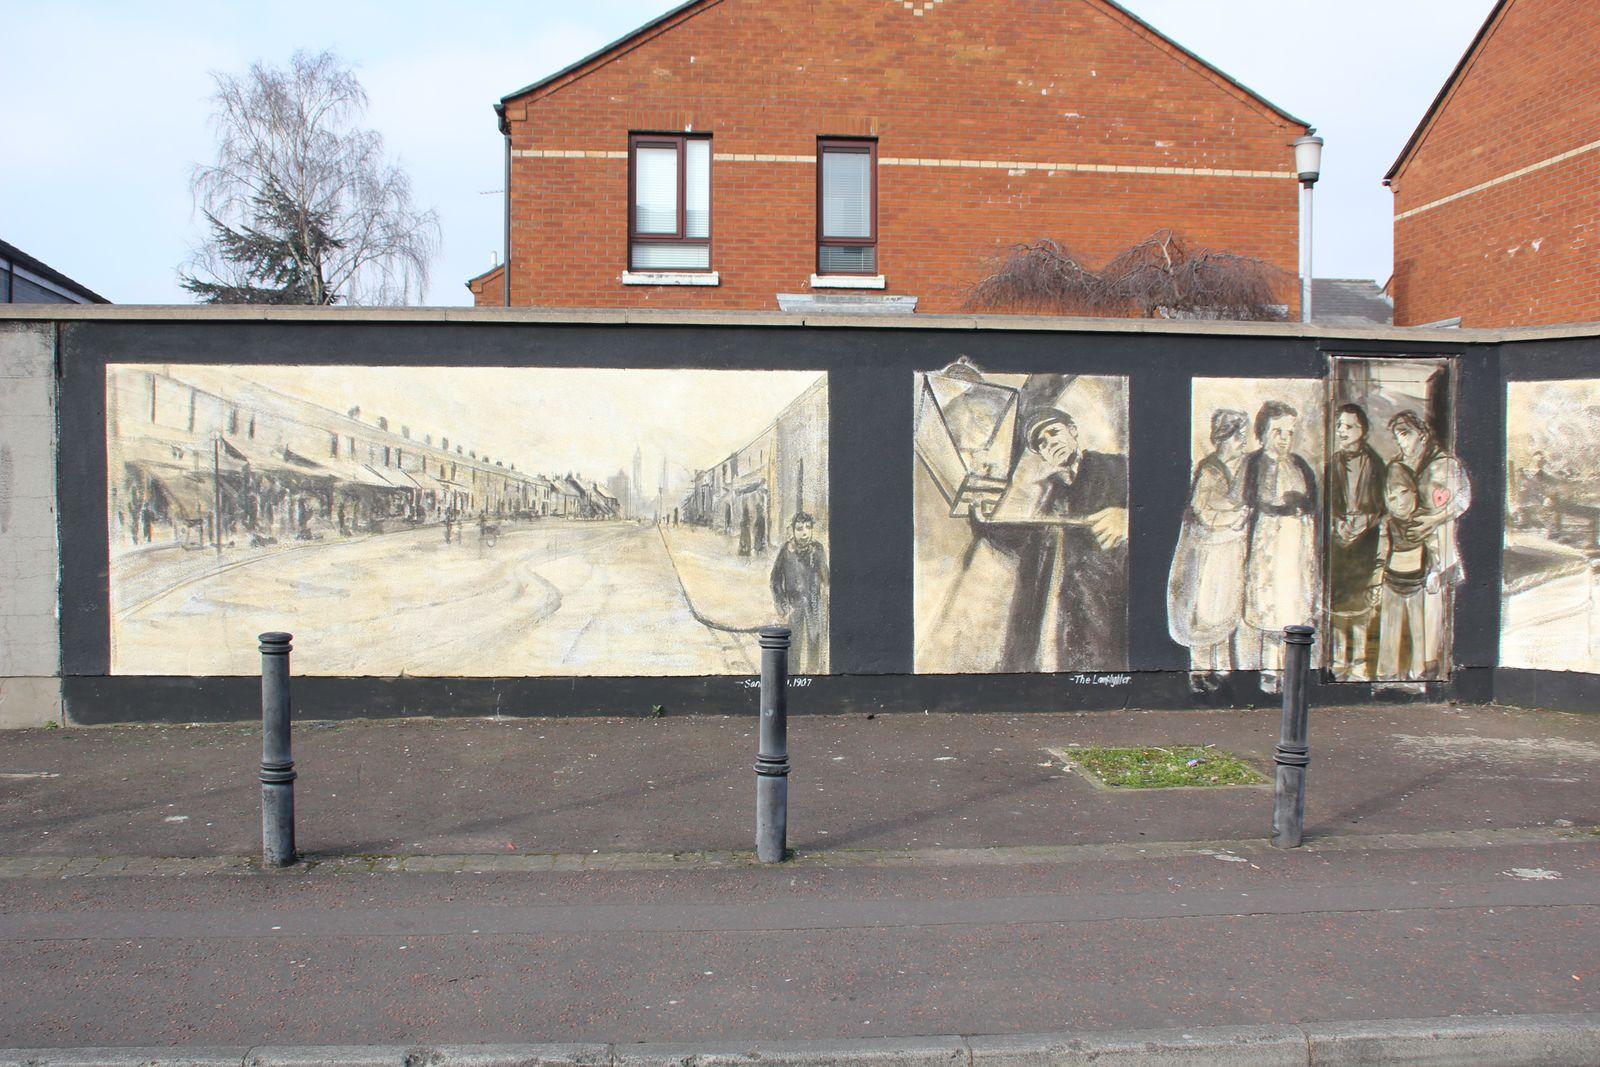 448) Sandy Row, South Belfast